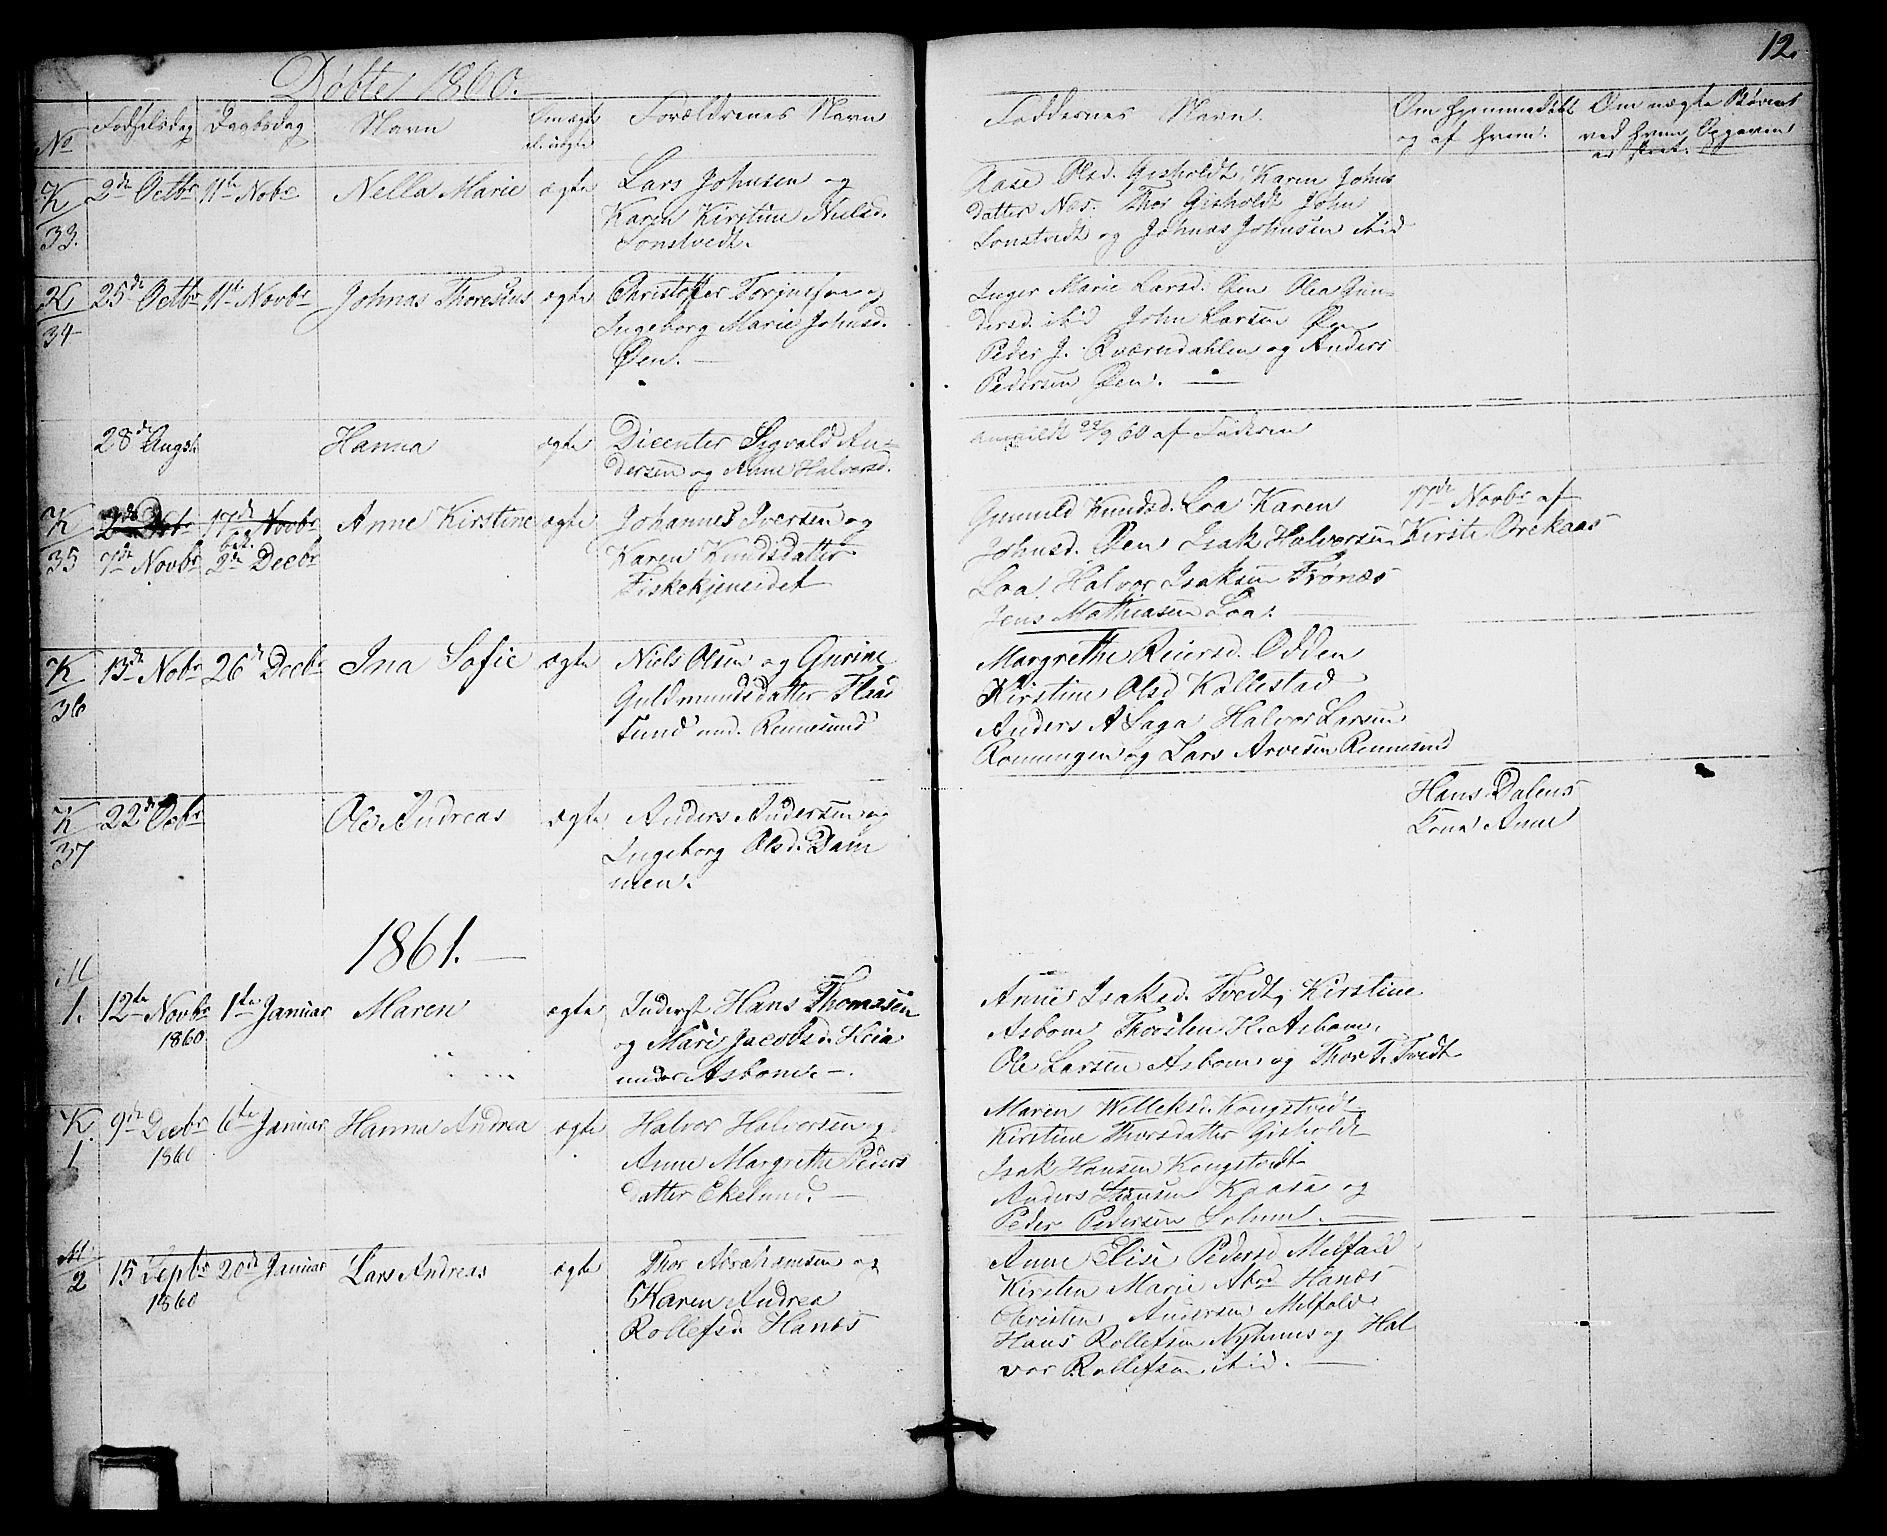 SAKO, Solum kirkebøker, G/Gb/L0002: Klokkerbok nr. II 2, 1859-1879, s. 12